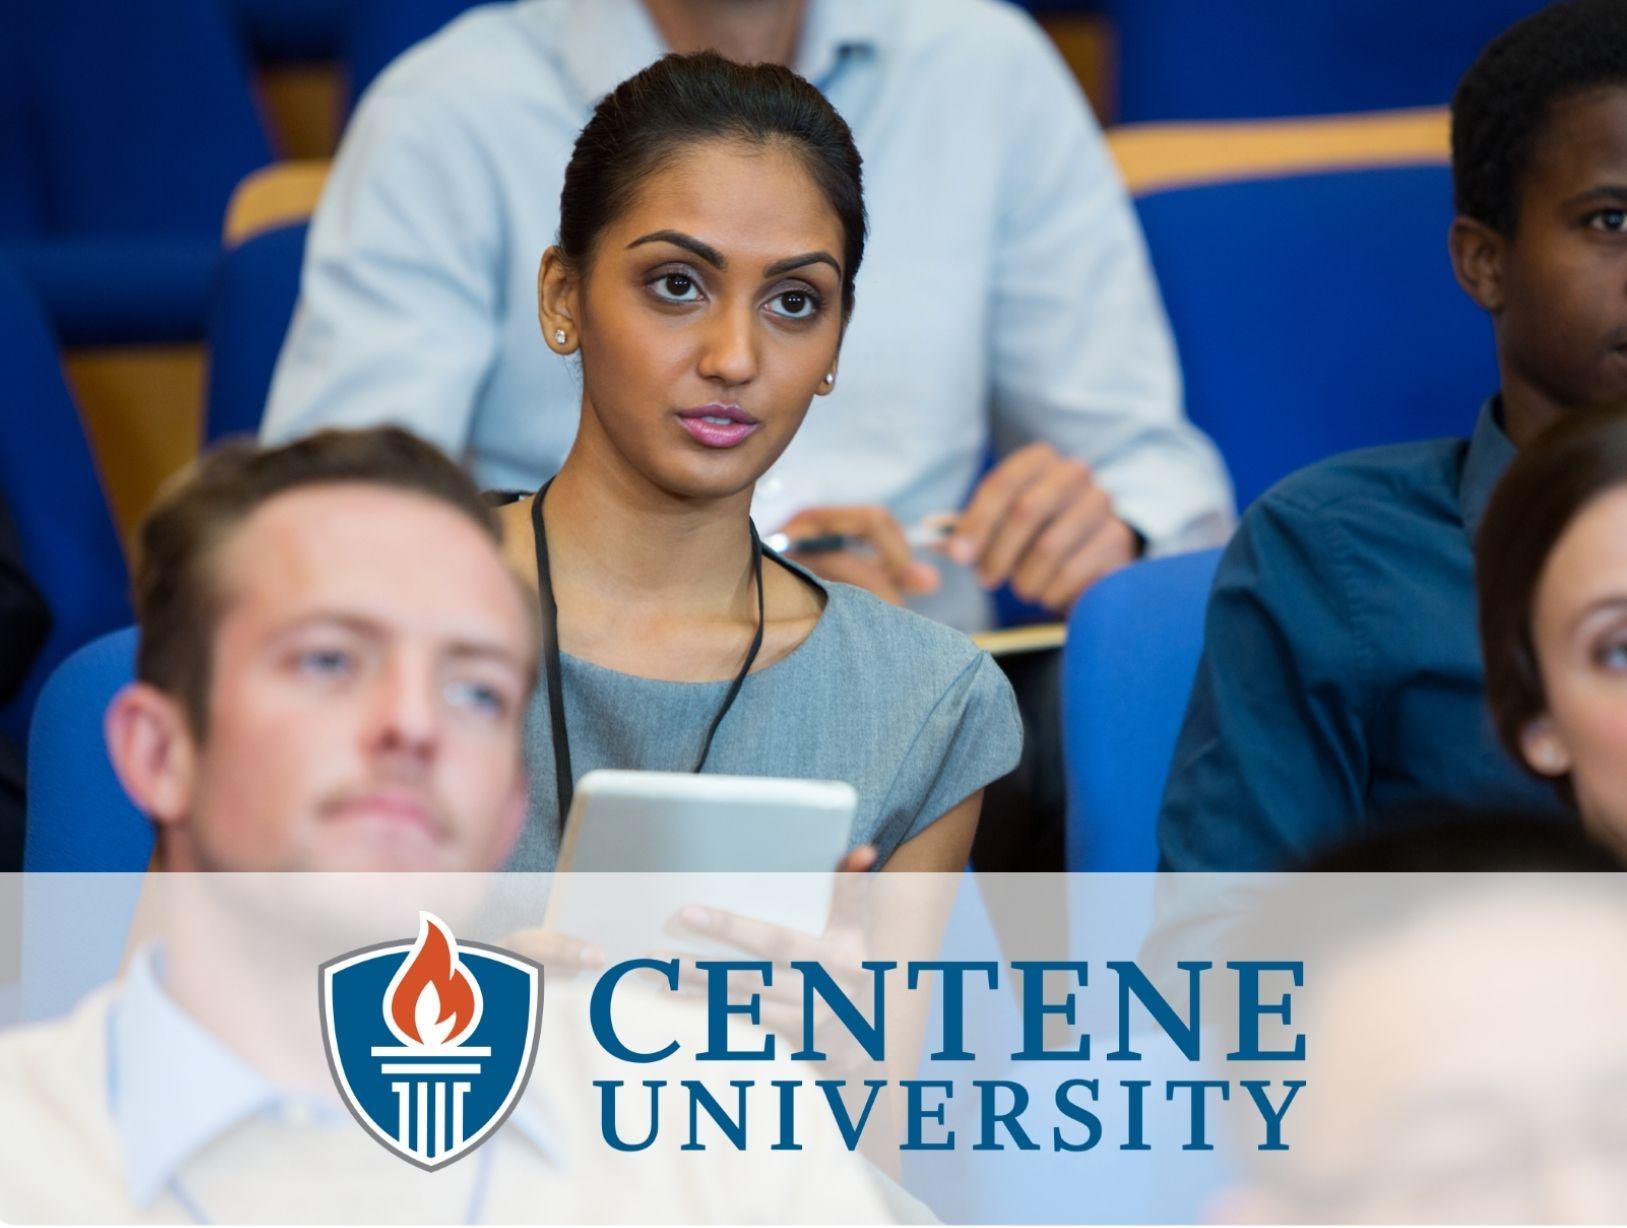 Centene University